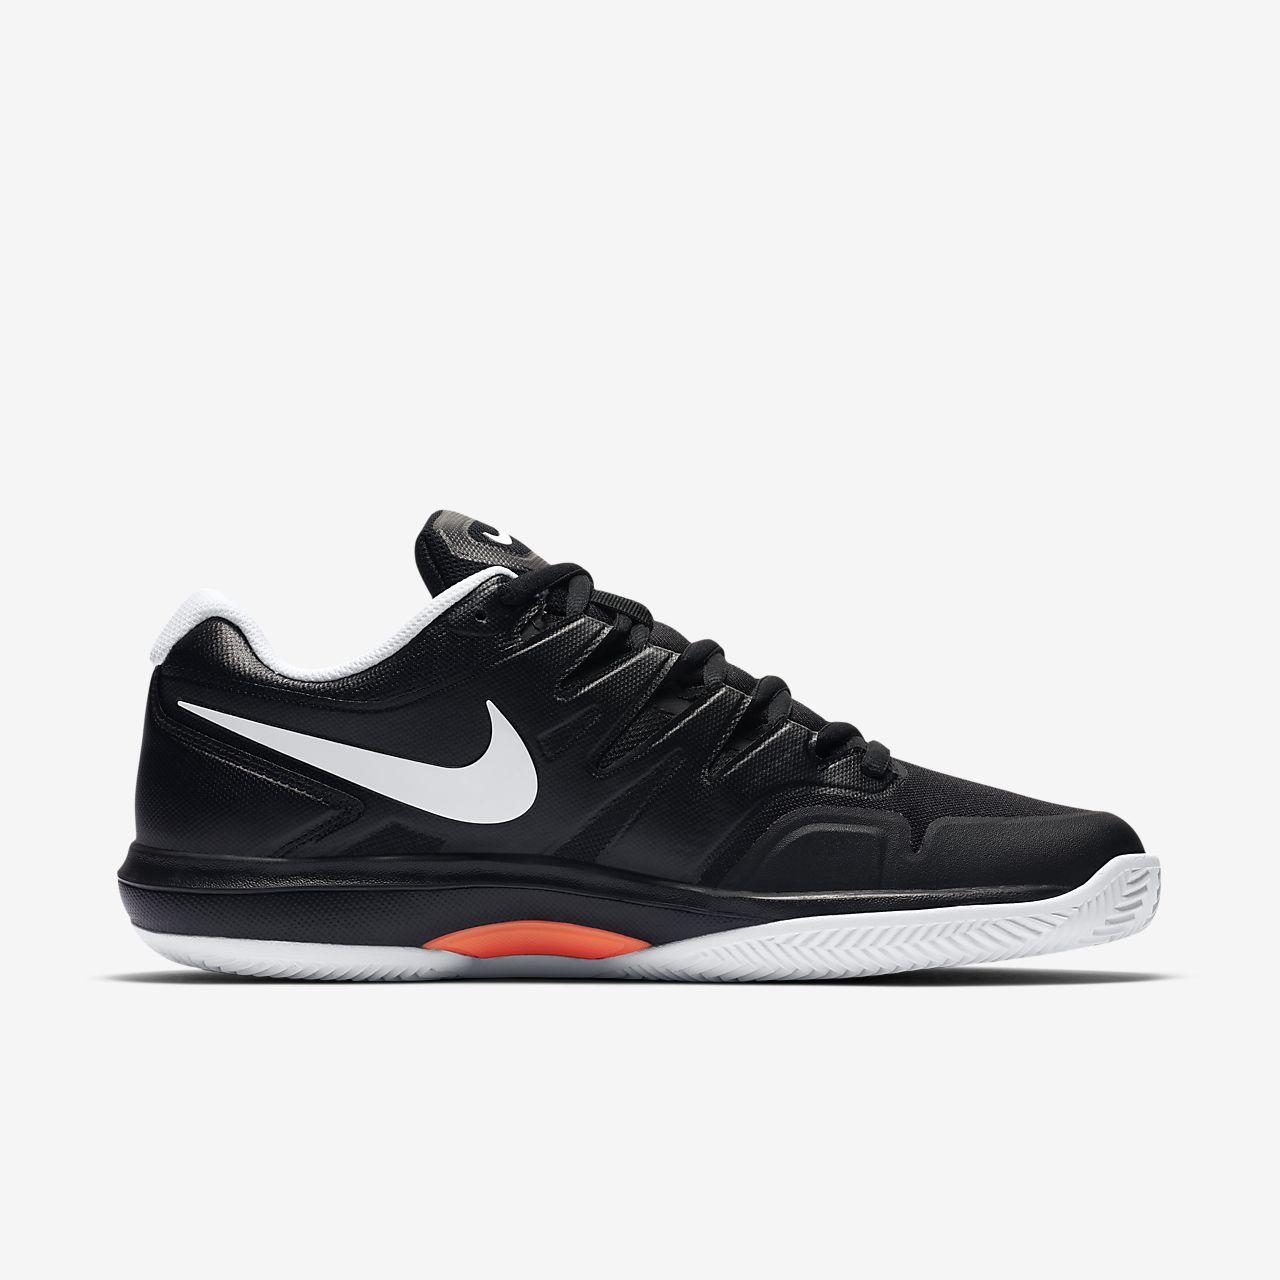 572542c184d Nike Air Zoom Prestige Clay Men s Tennis Shoe. Nike.com CA